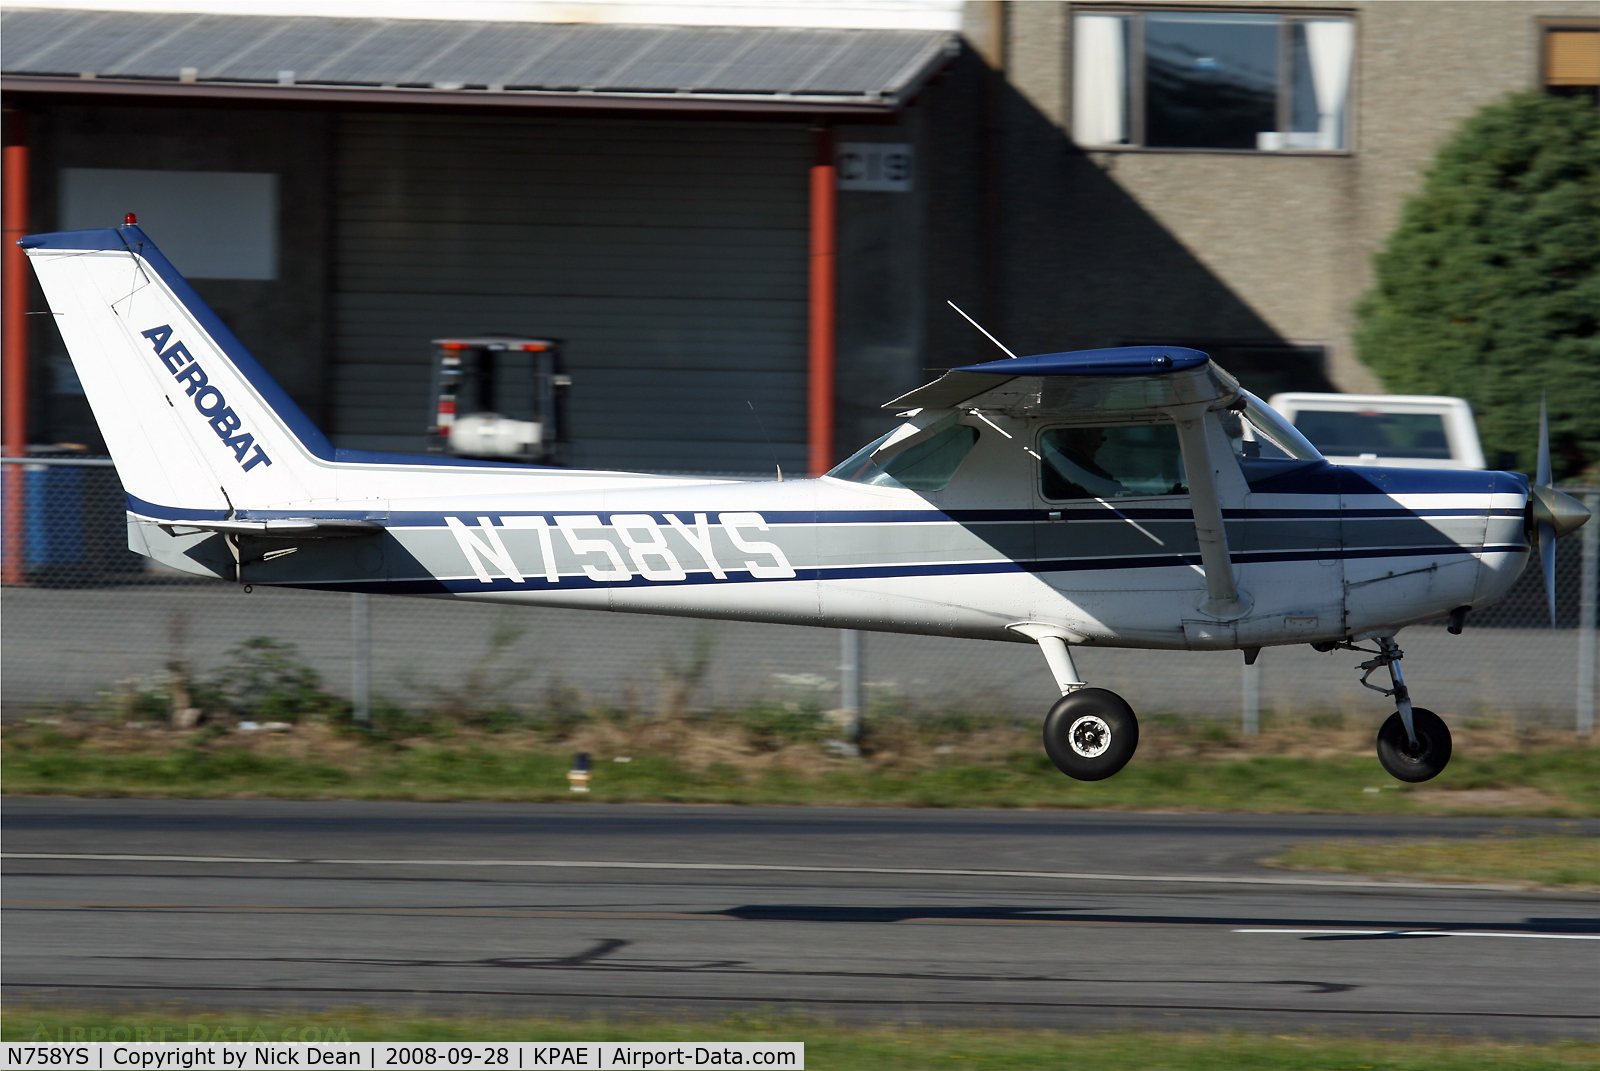 N758YS, 1982 Cessna A152 Aerobat C/N A1521017, /